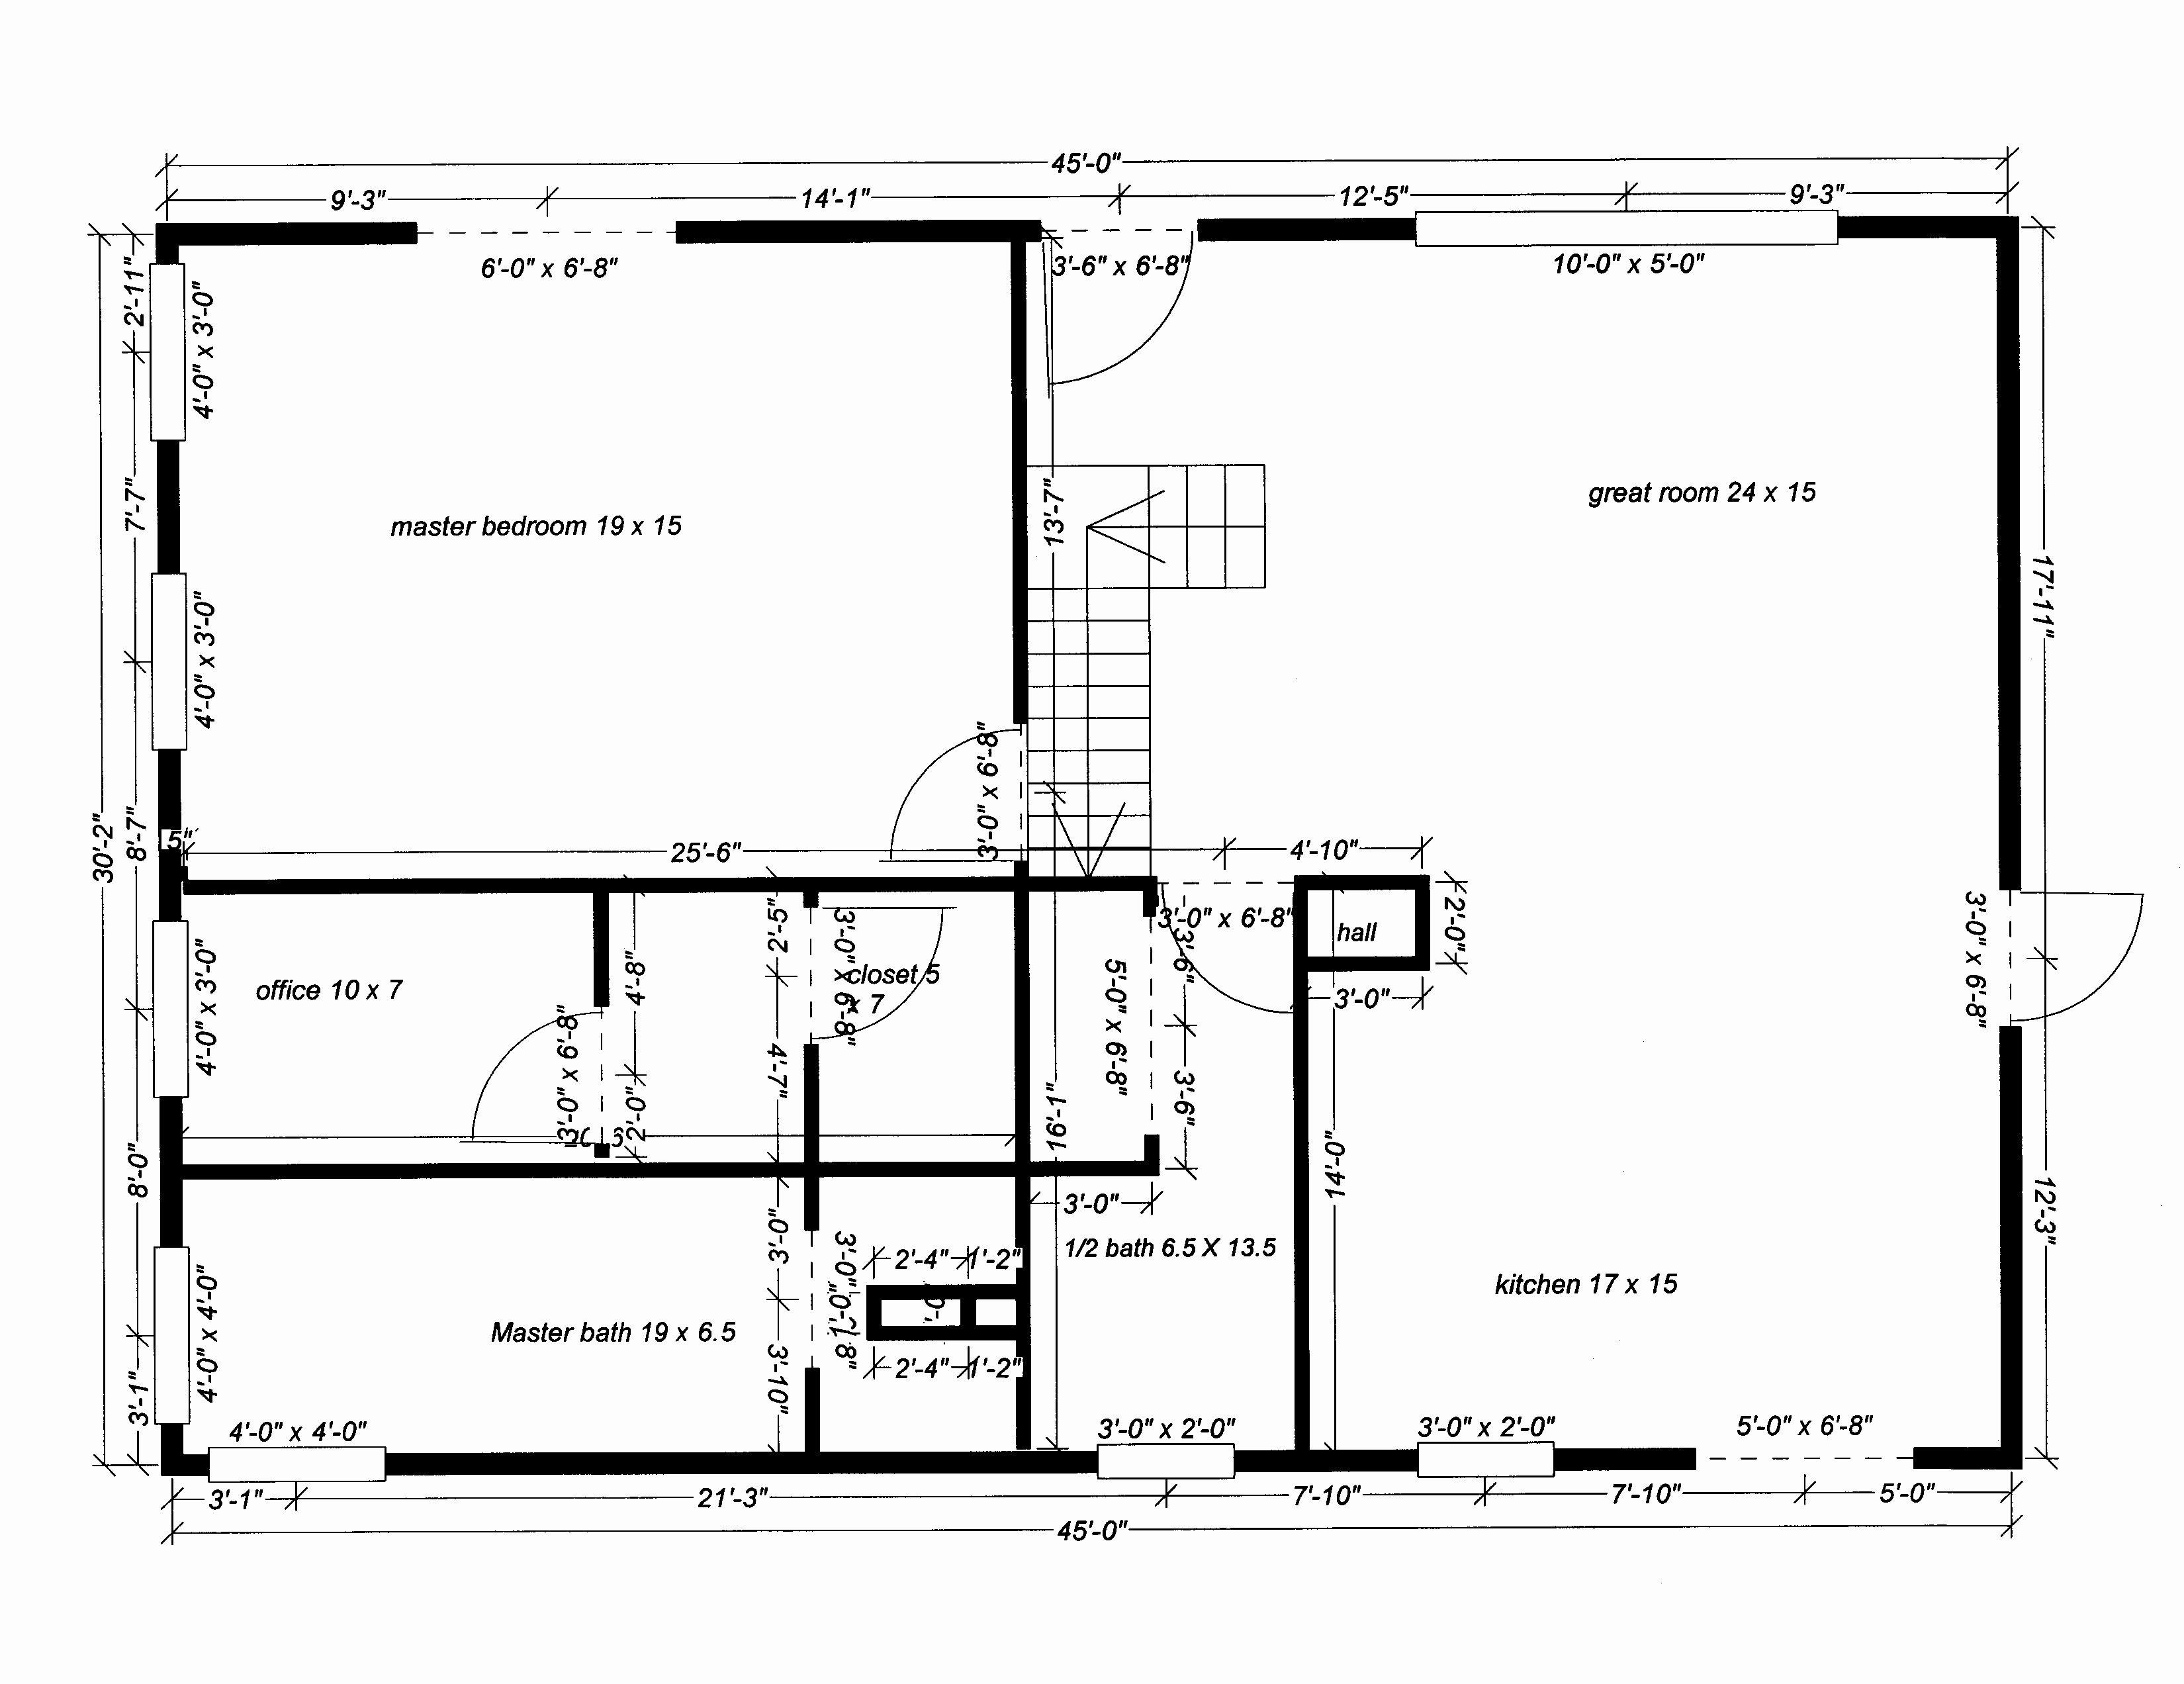 Excel Floor Plan Template Awesome Fresh Floor Plan Excel Gallery Home House Floor Plans